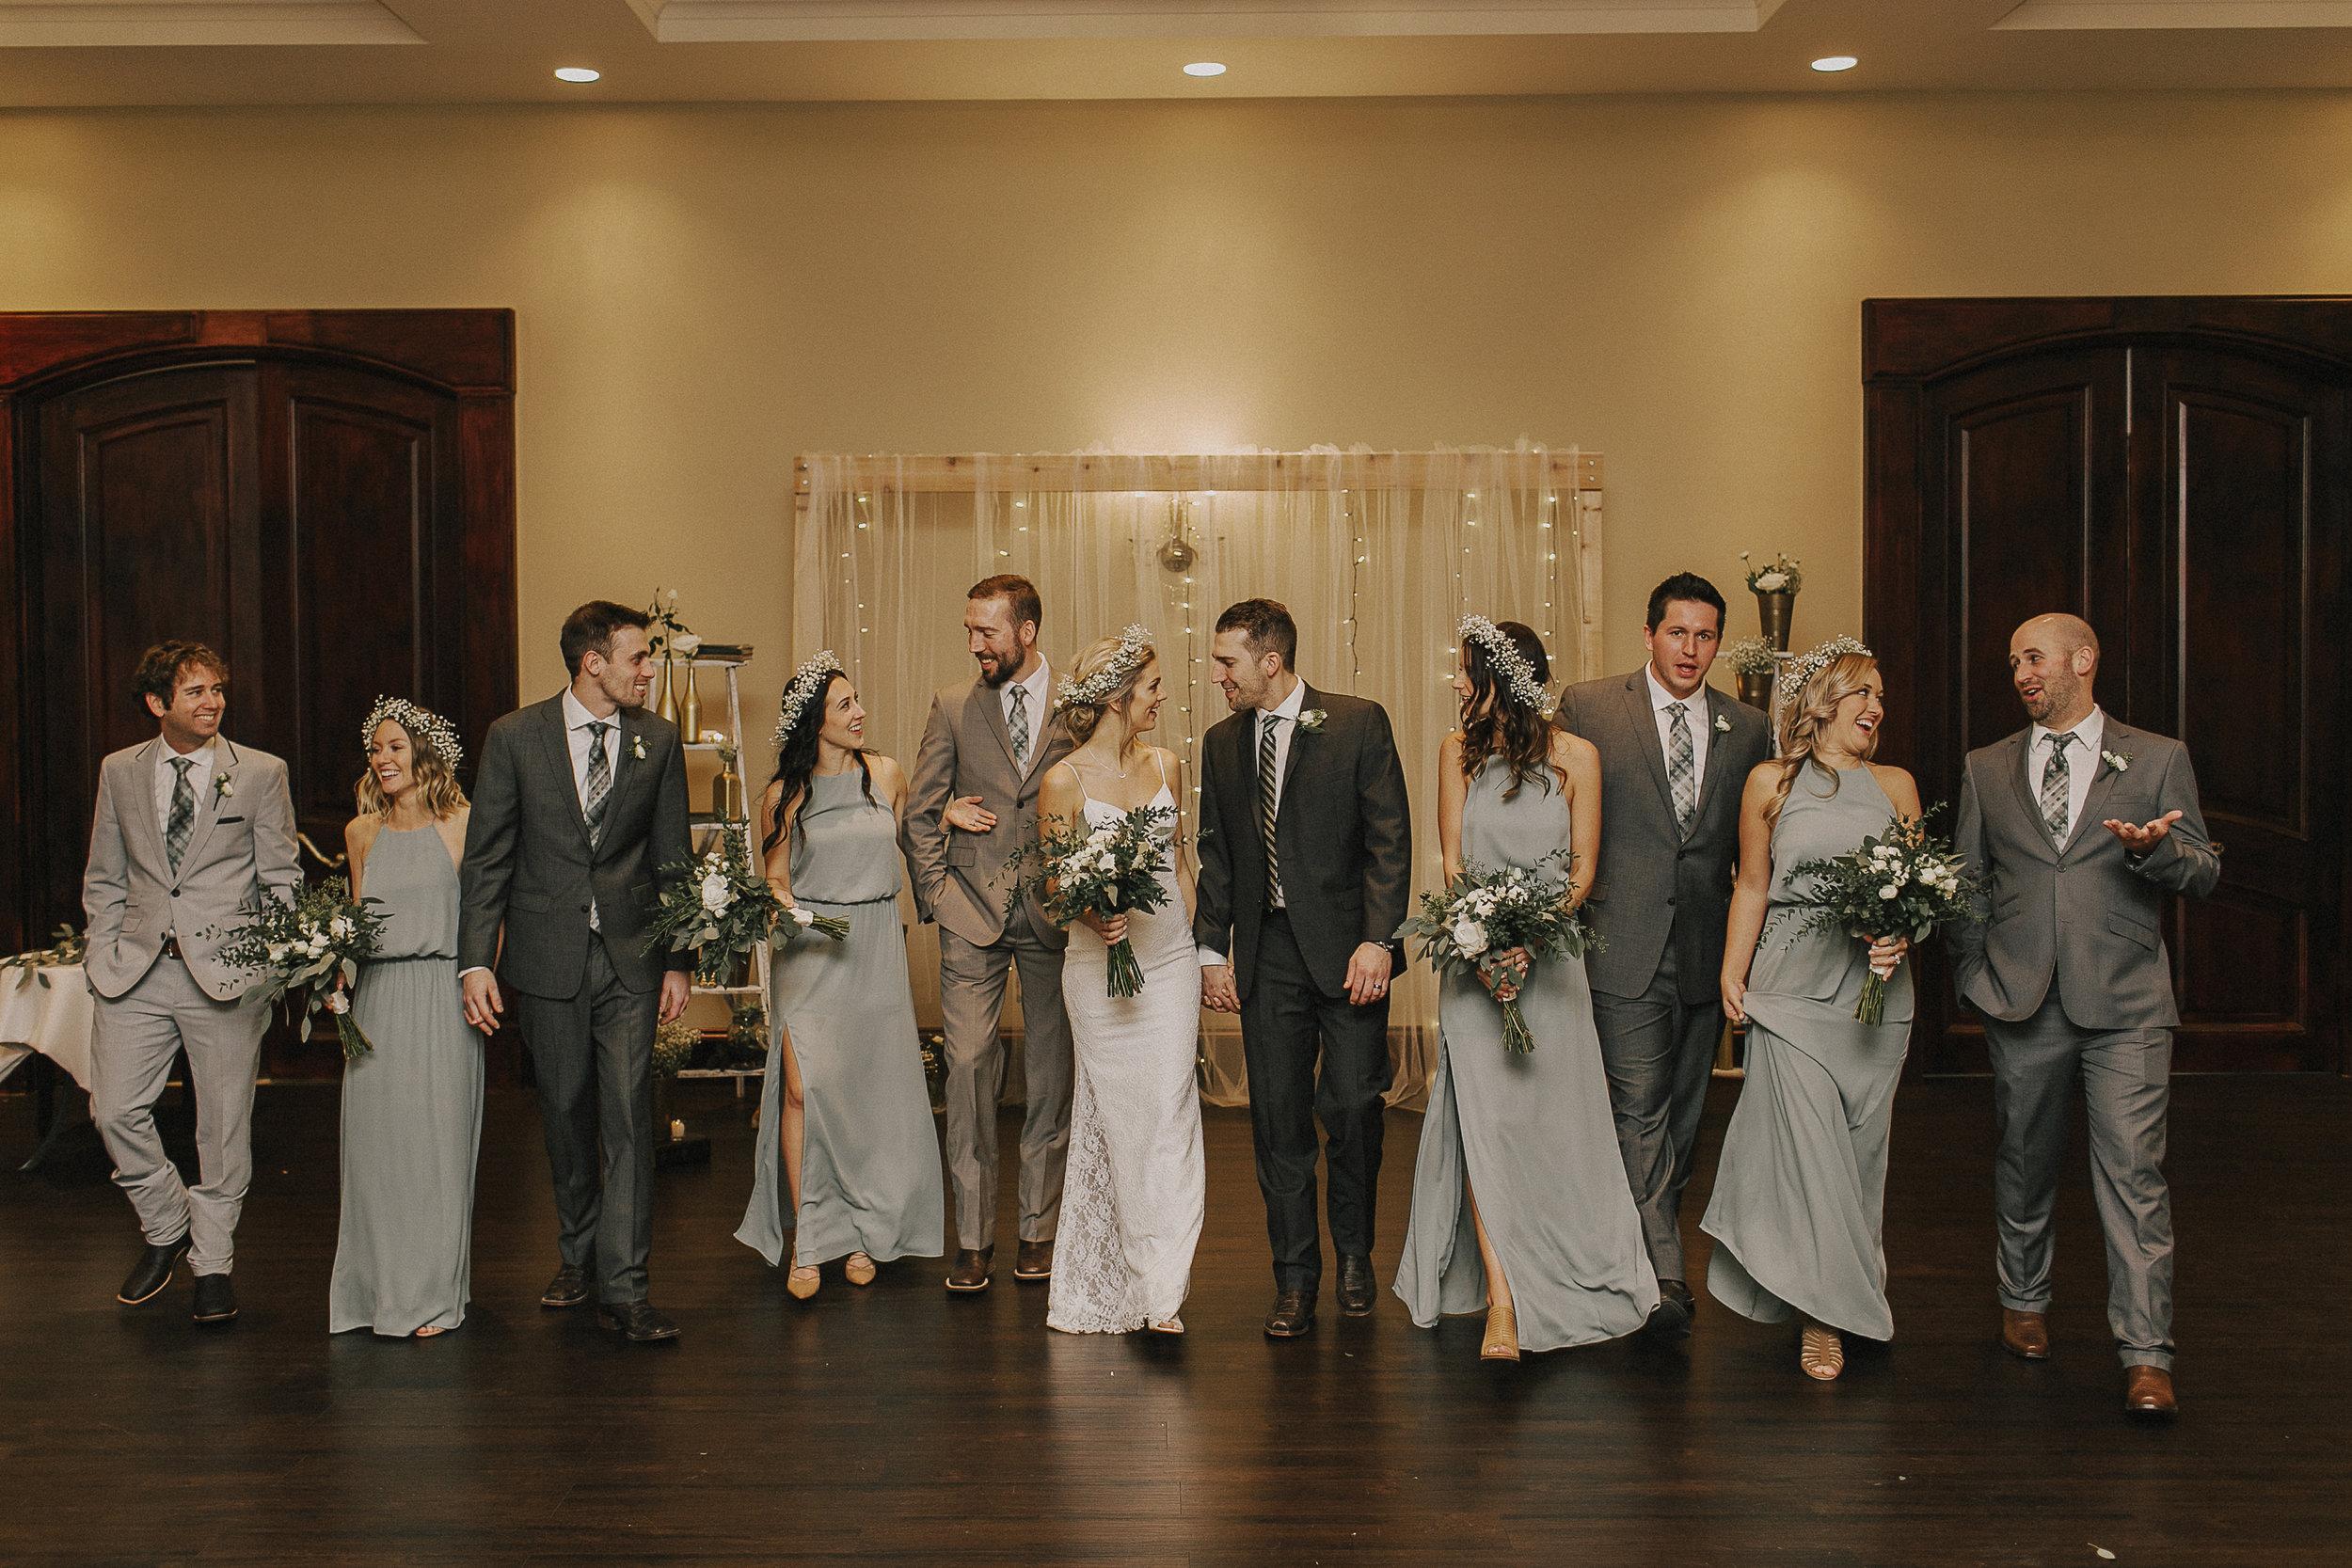 mark-and-liz-wedding-474.jpg